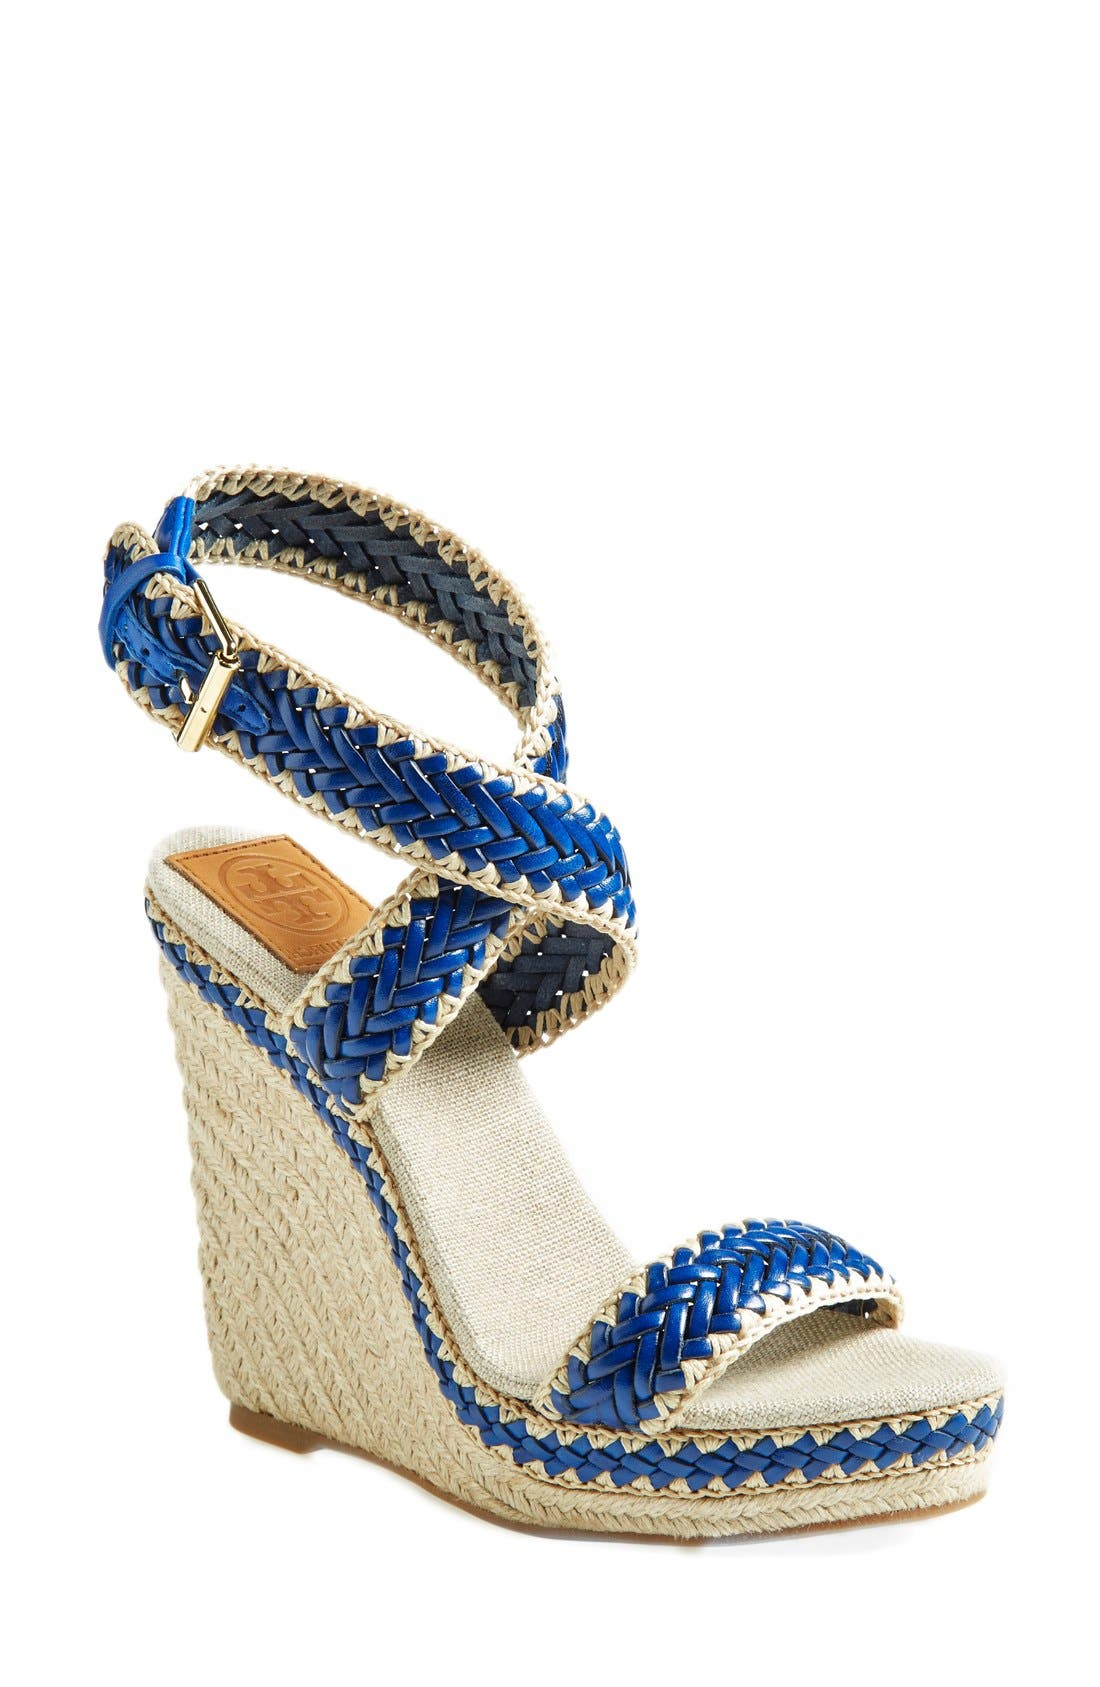 Main Image - Tory Burch 'Lilah' Espadrille Wedge Sandal (Women)